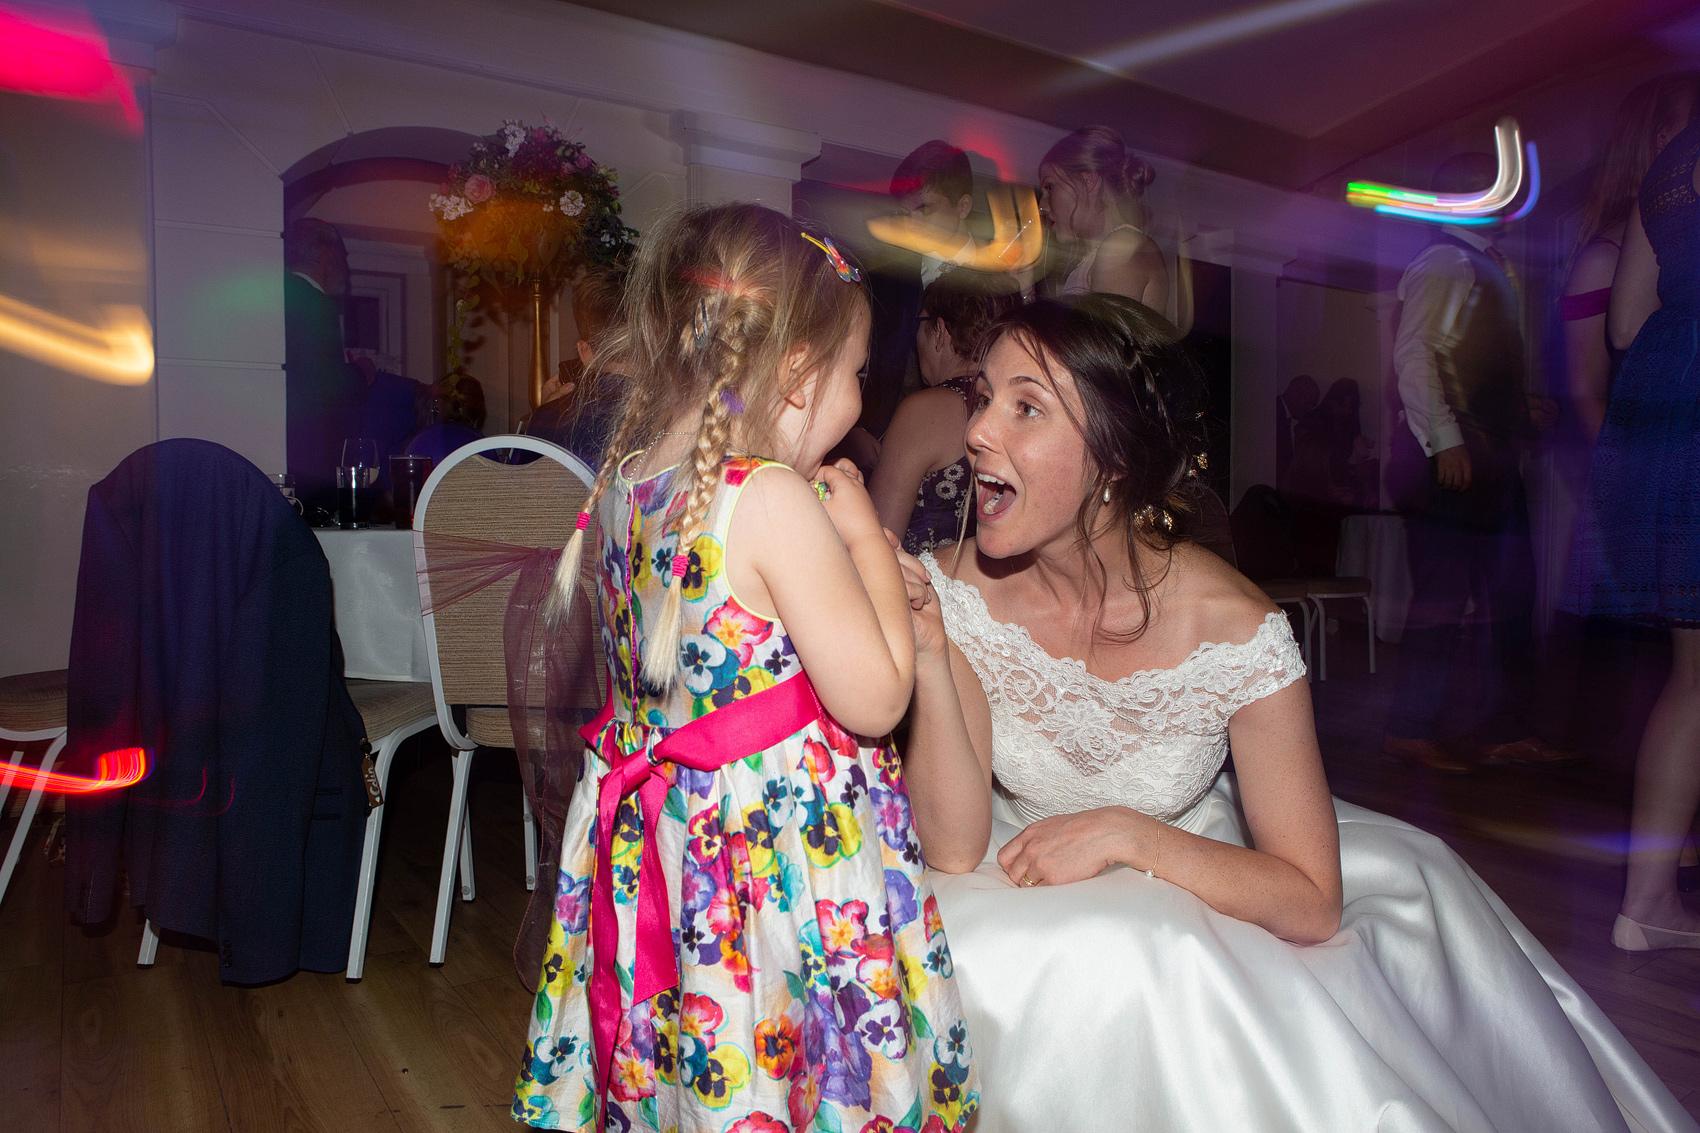 Claire_Basiuk_Richmond_Park,_London_Wedding_Photography_-35.jpg